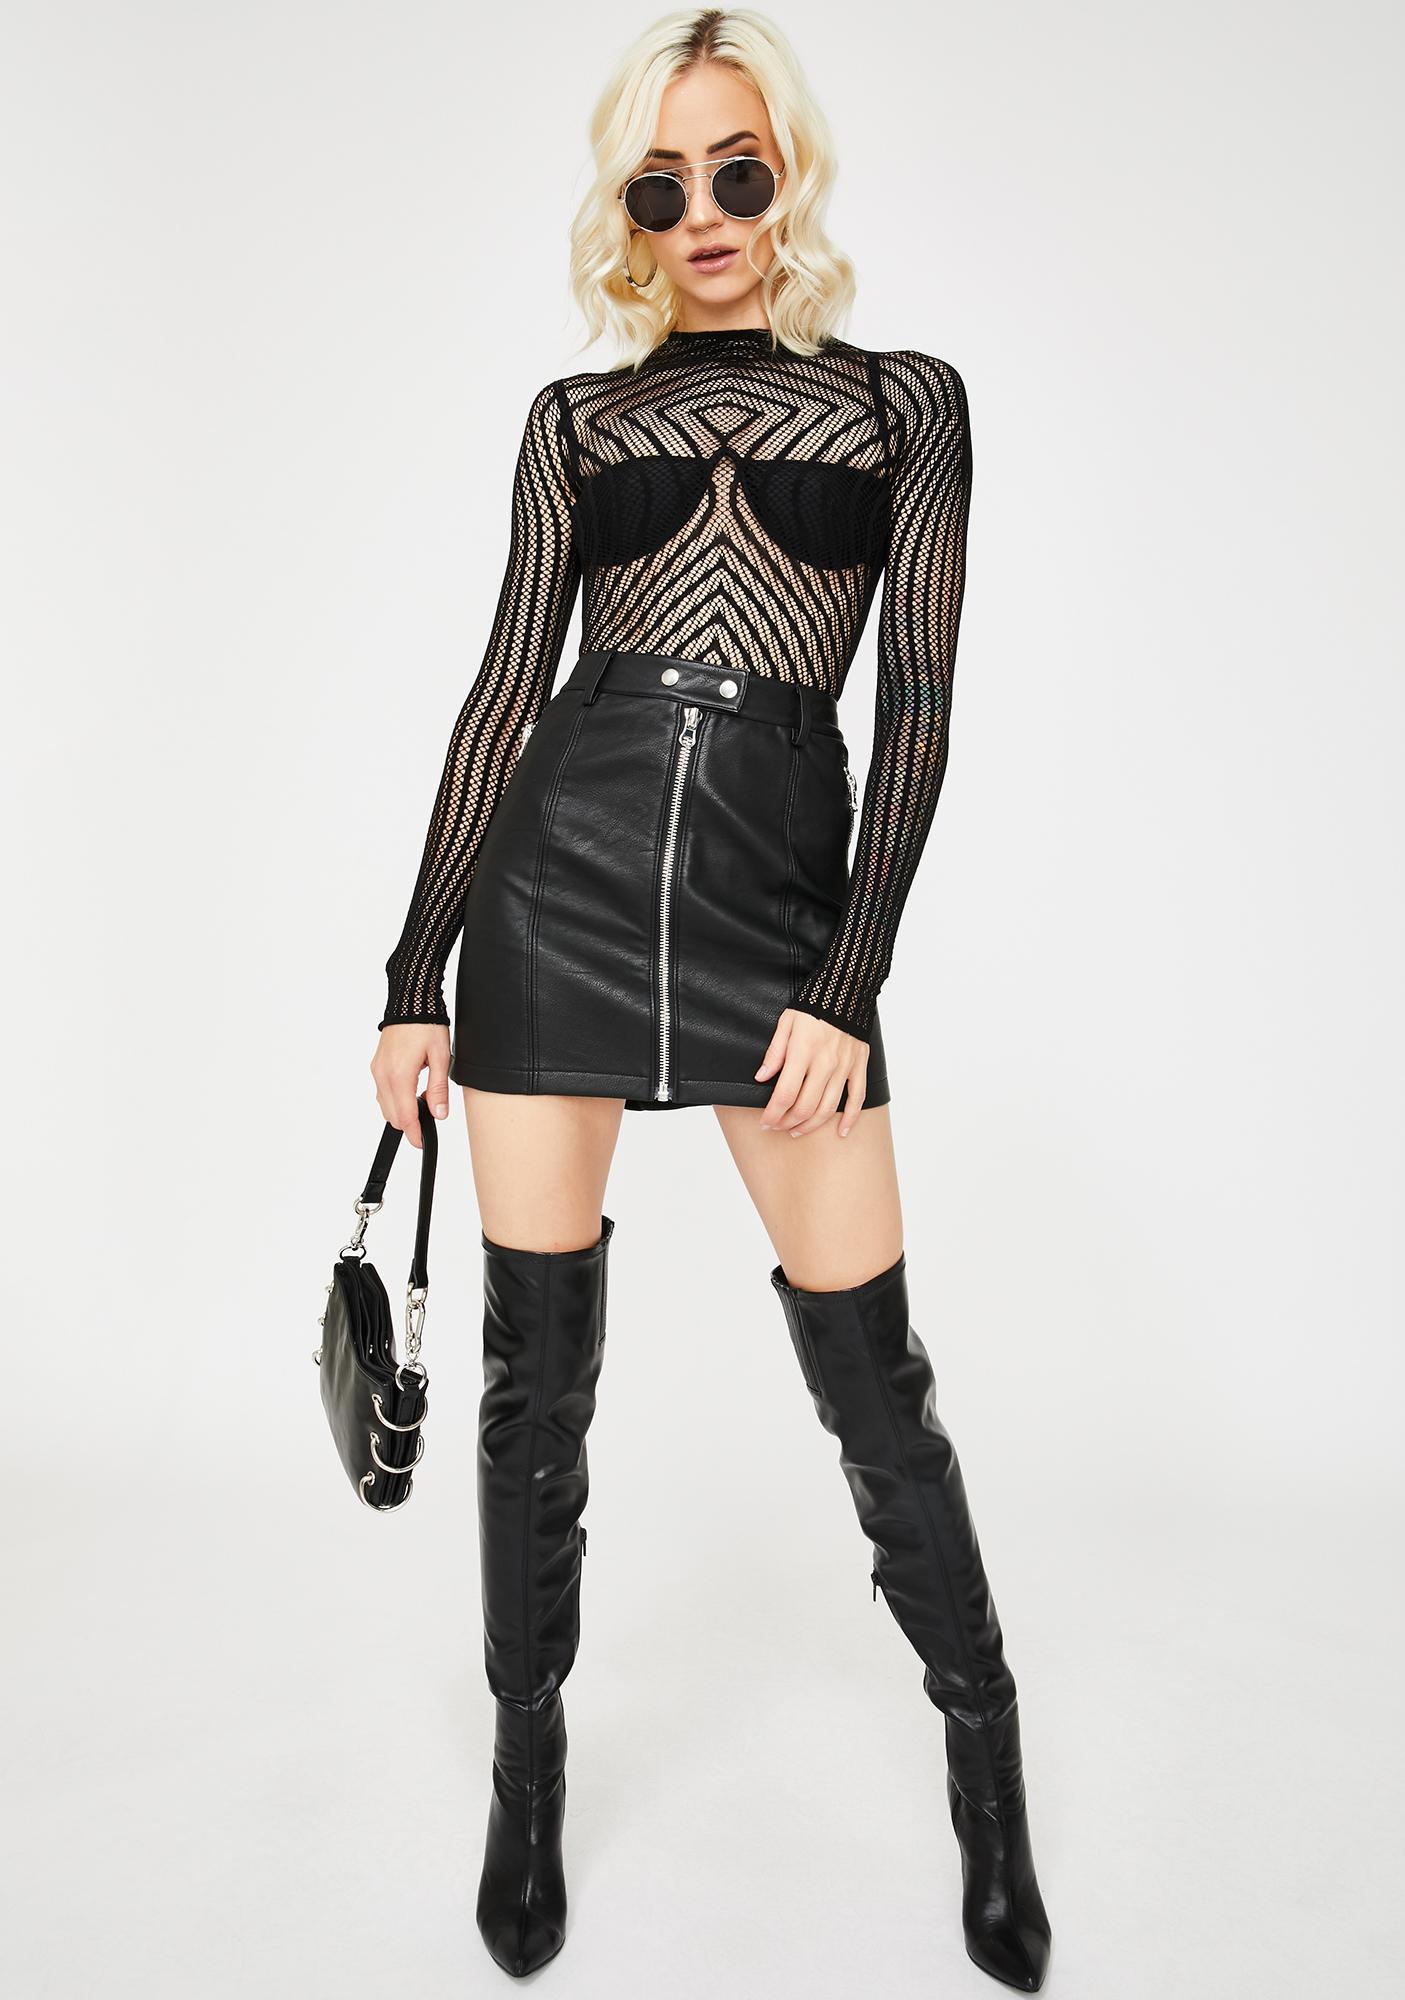 Got U Hypnotized Sheer Bodysuit